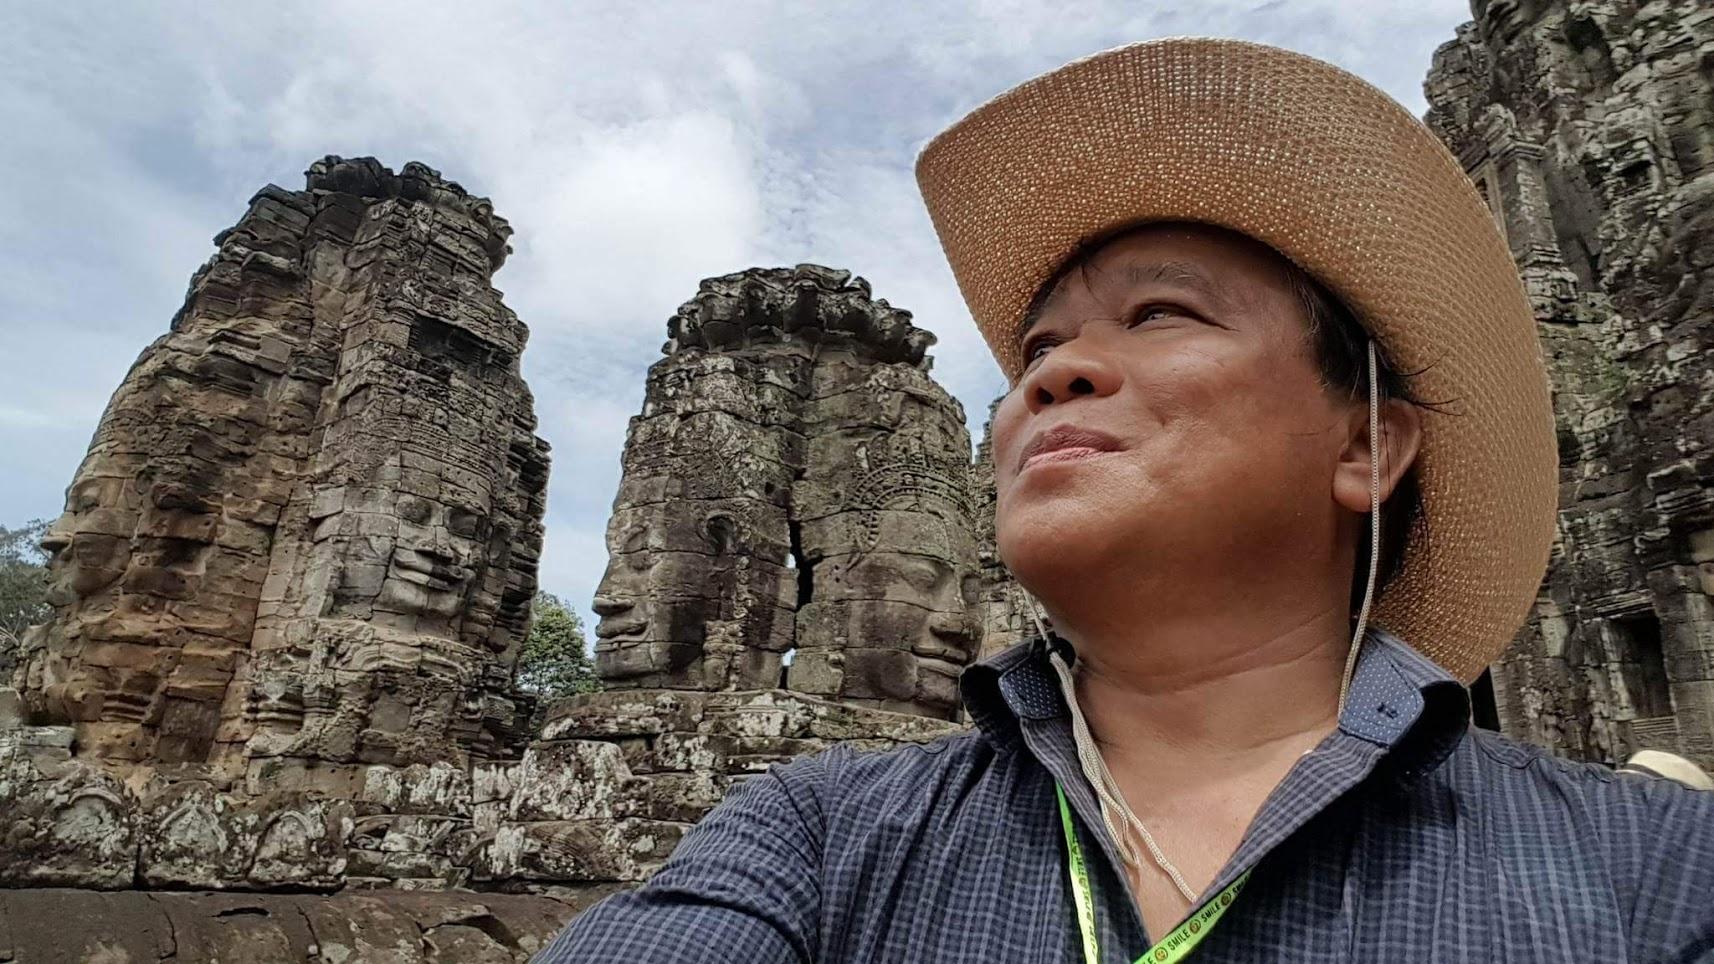 Anurak Panyanuwat at a historical site in Cambodia